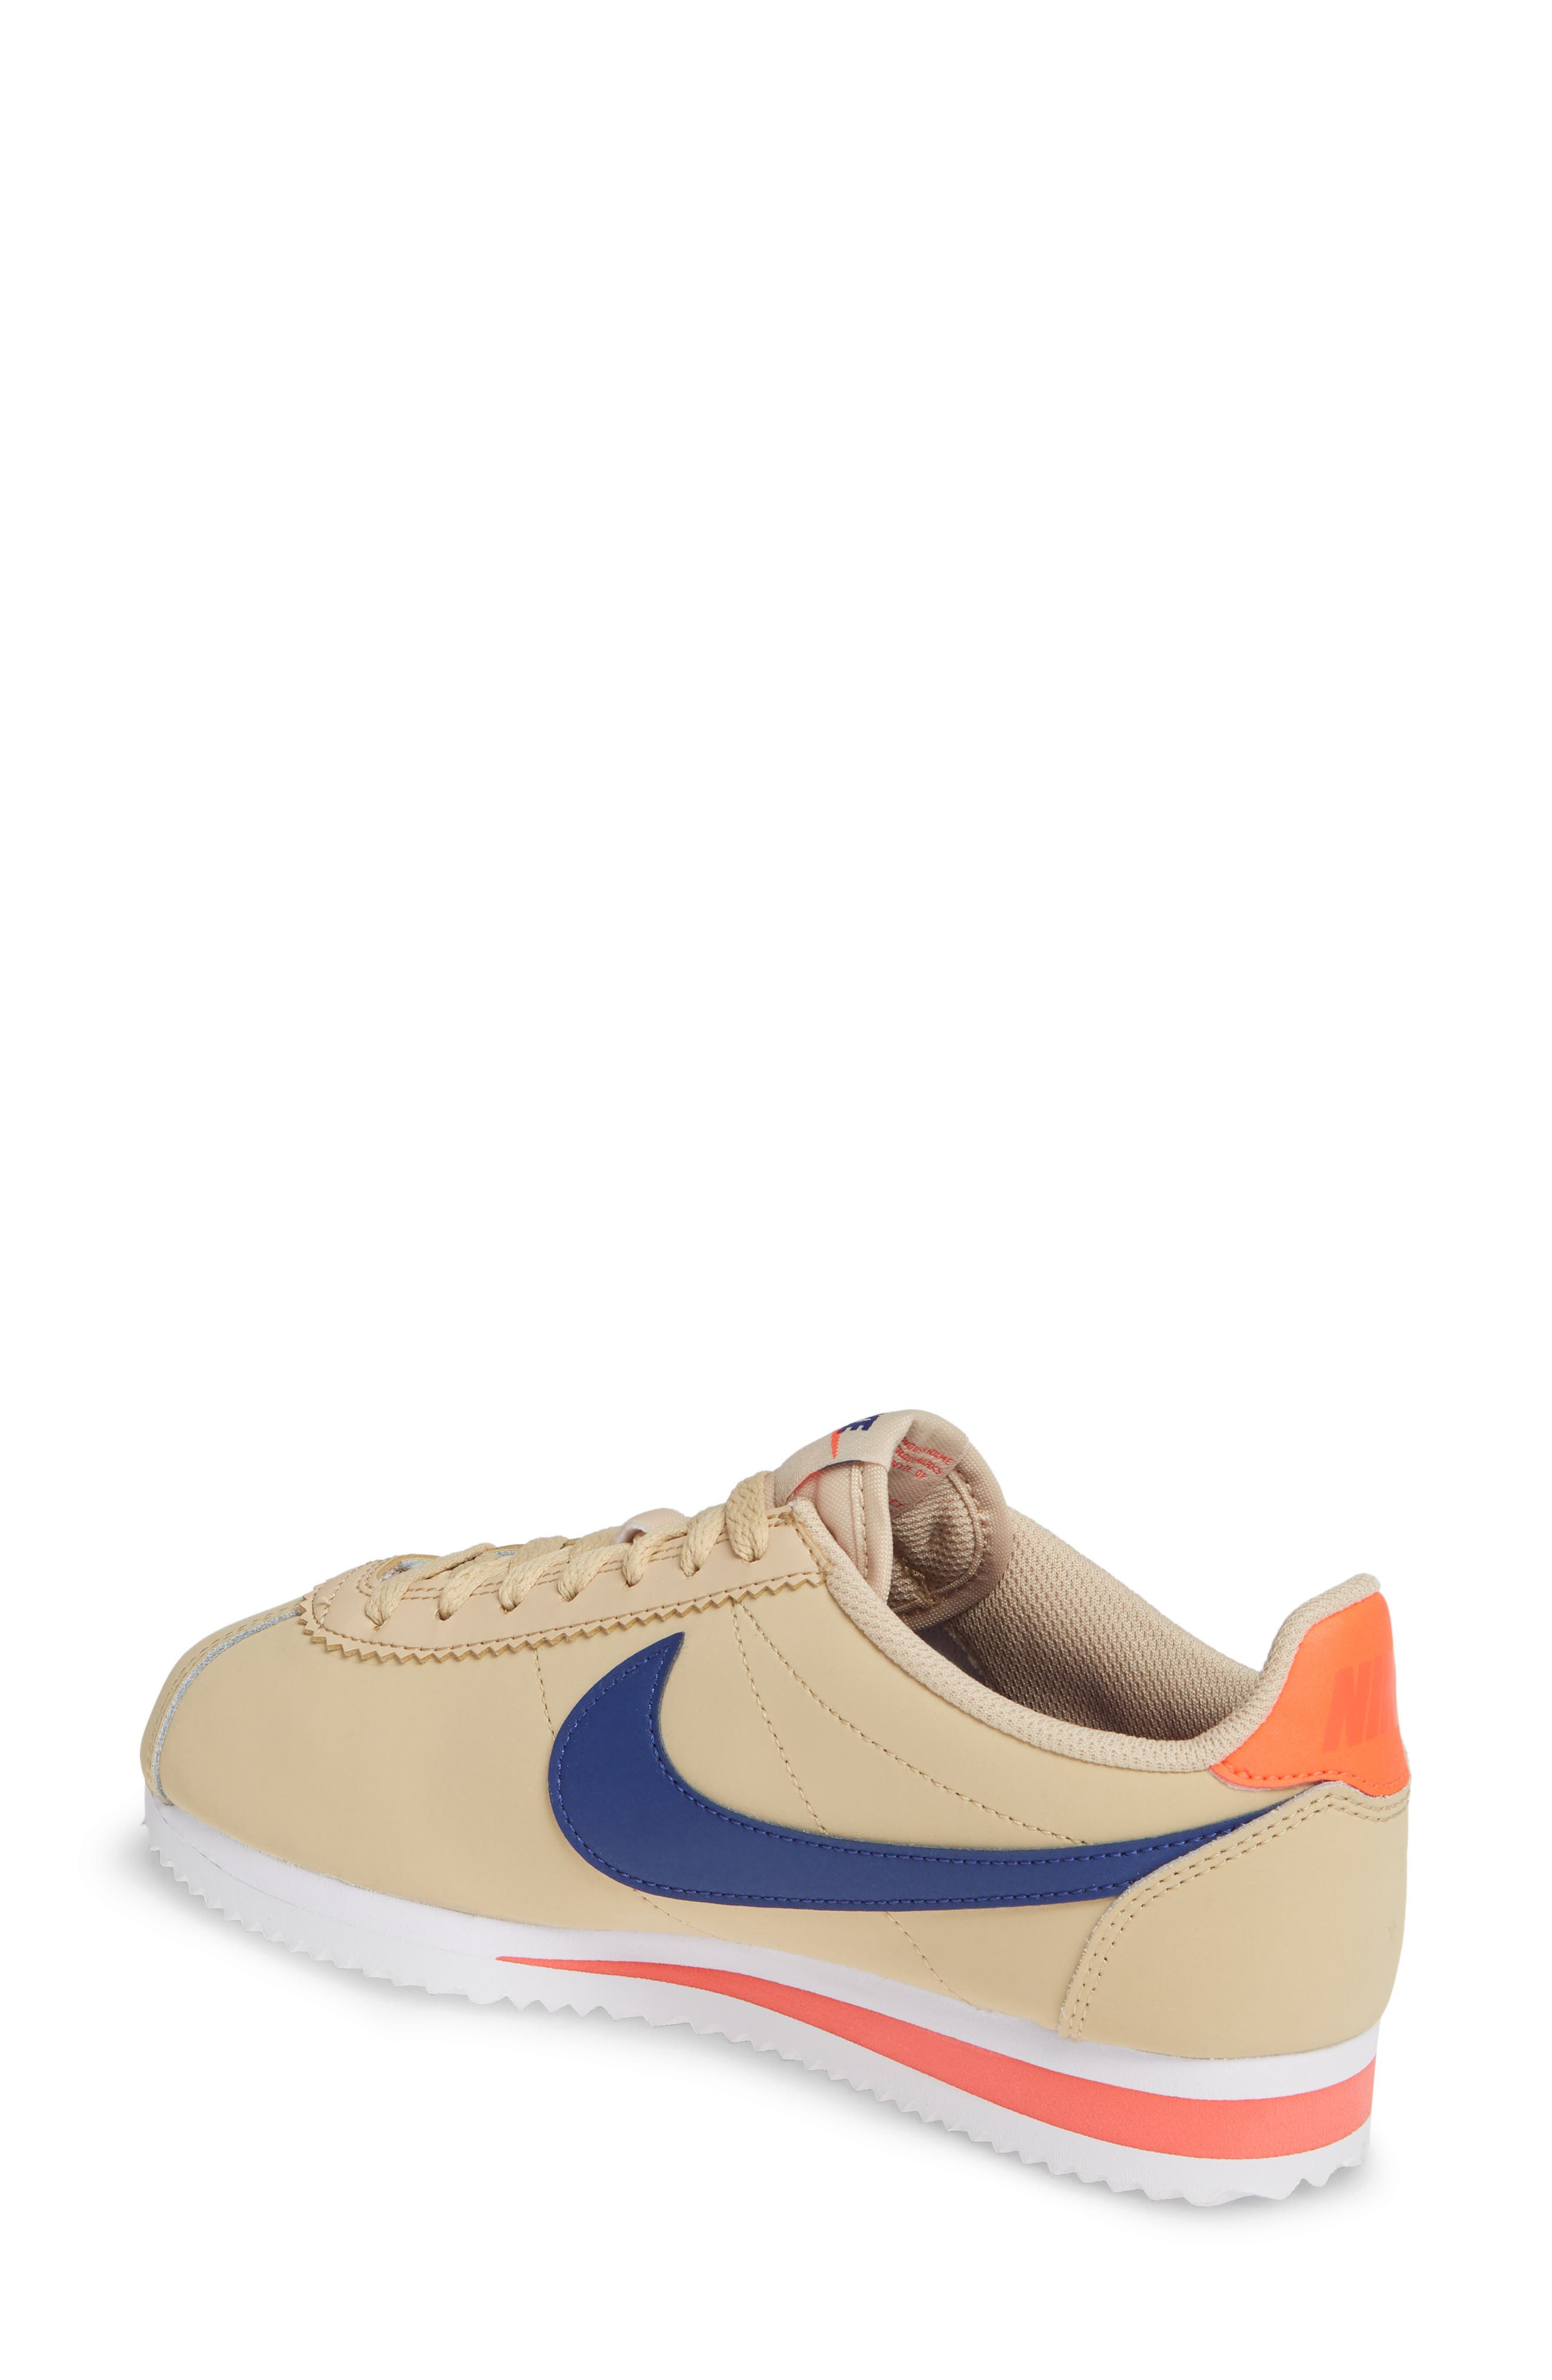 ,                             Classic Cortez Sneaker,                             Alternate thumbnail 2, color,                             DESERT ORE/ DEEP ROYAL BLUE